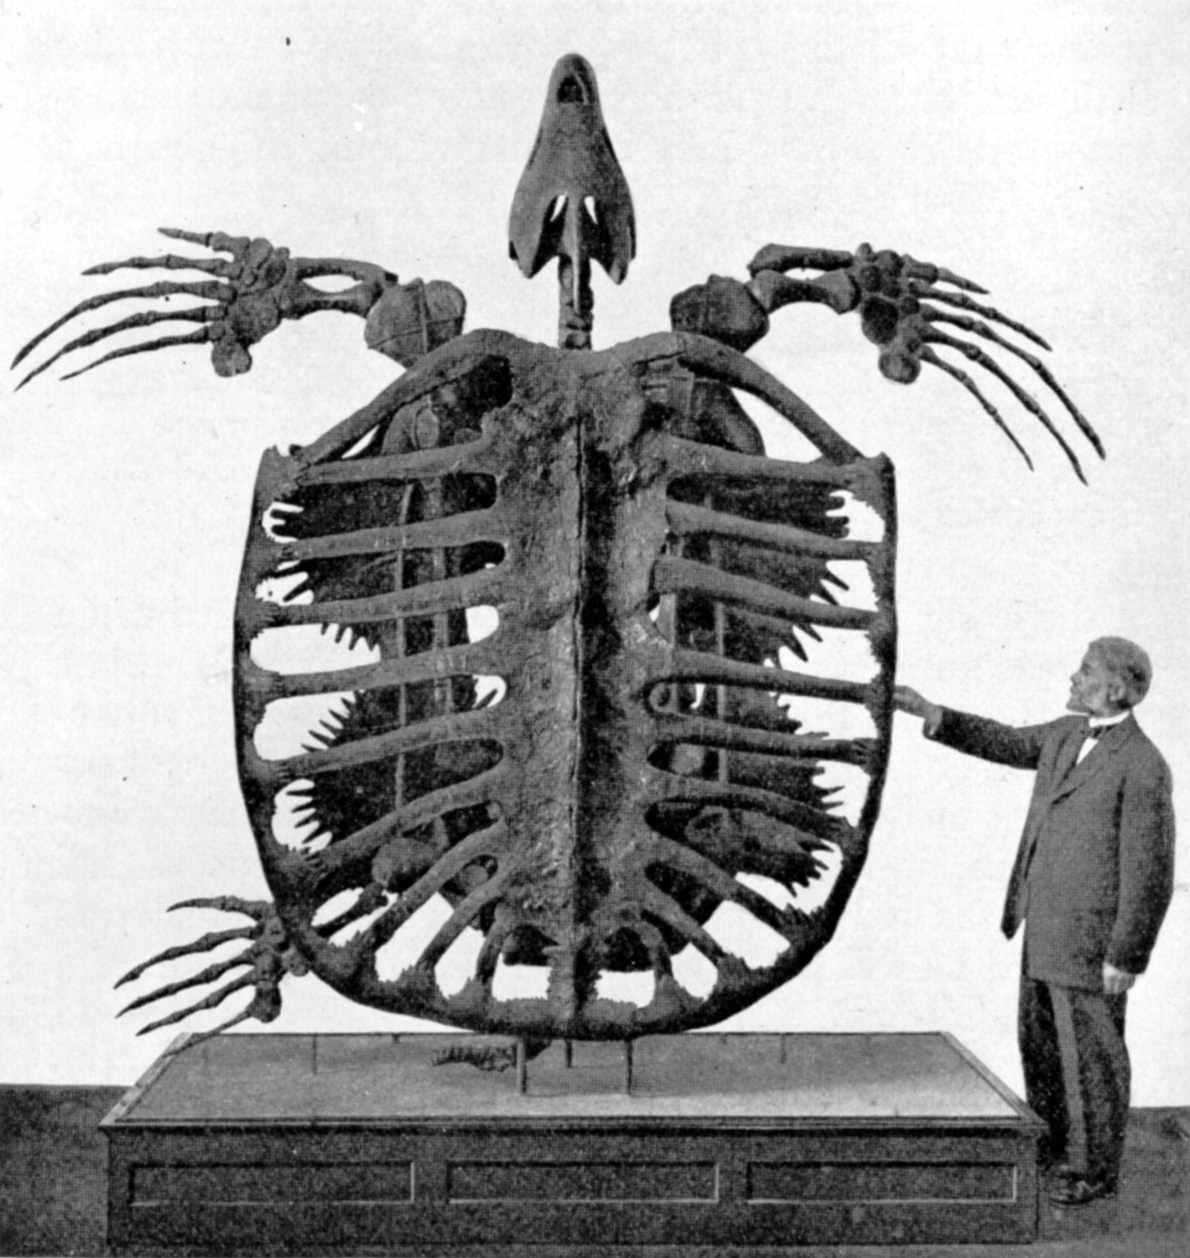 Archelon skeleton By Frederic A. Lucas,Public domain, via Wikimedia Commons